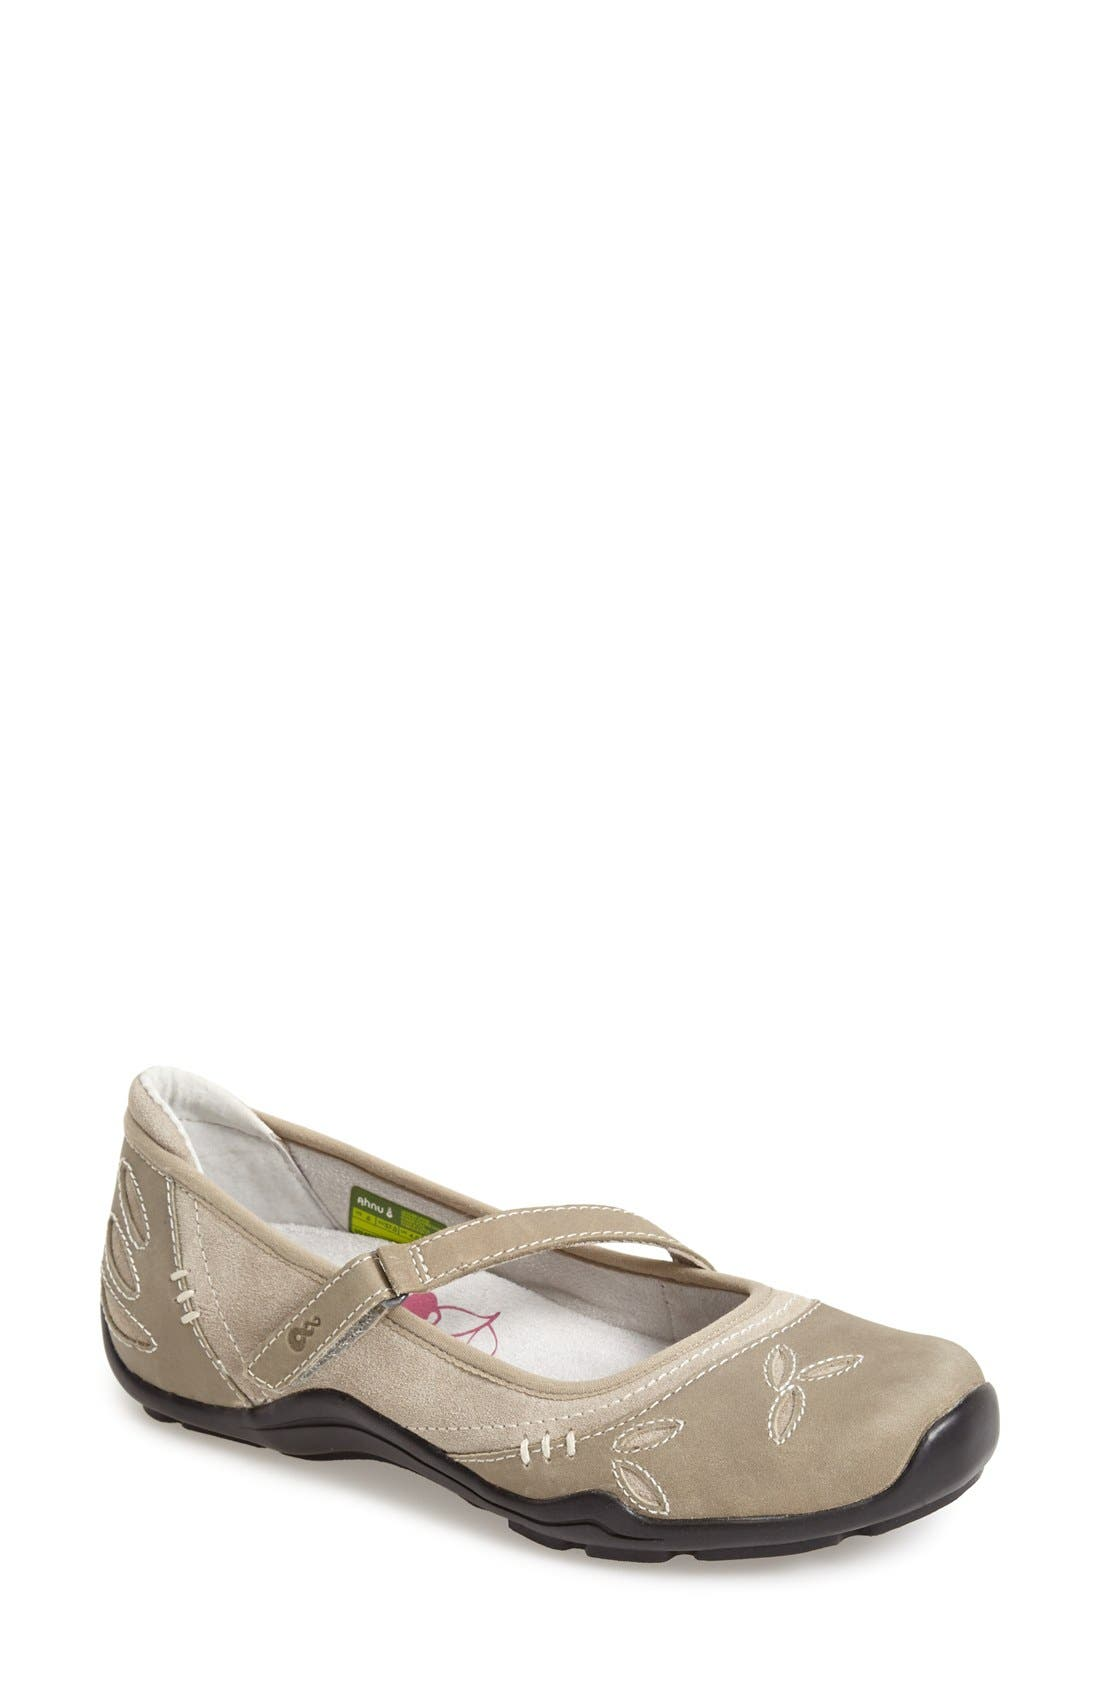 Alternate Image 1 Selected - Ahnu 'Gracie Pro' Leather Flat (Women)